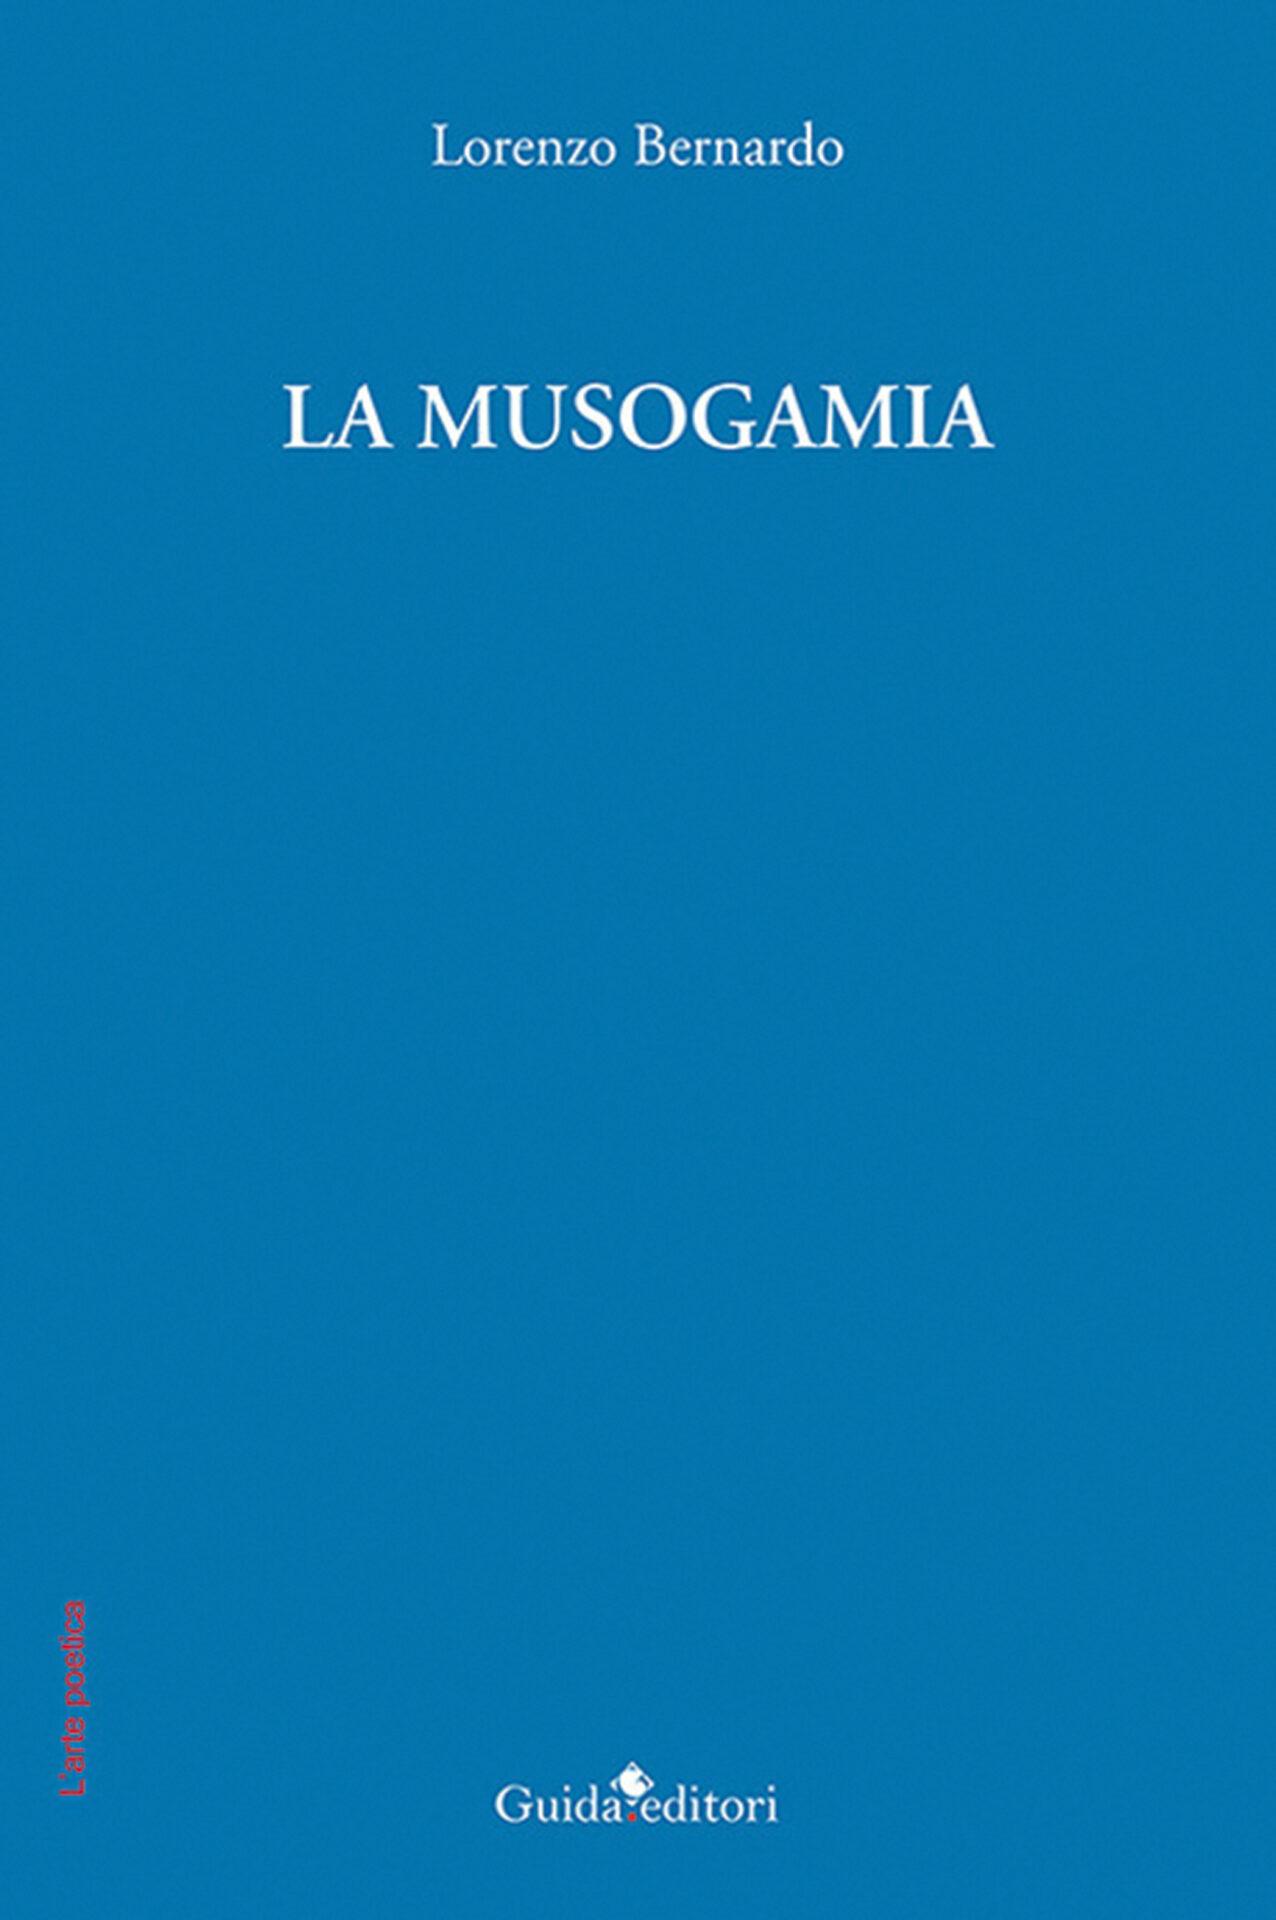 La Musogamia, Lorenzo Bernardo (Guida Editori, 2021)